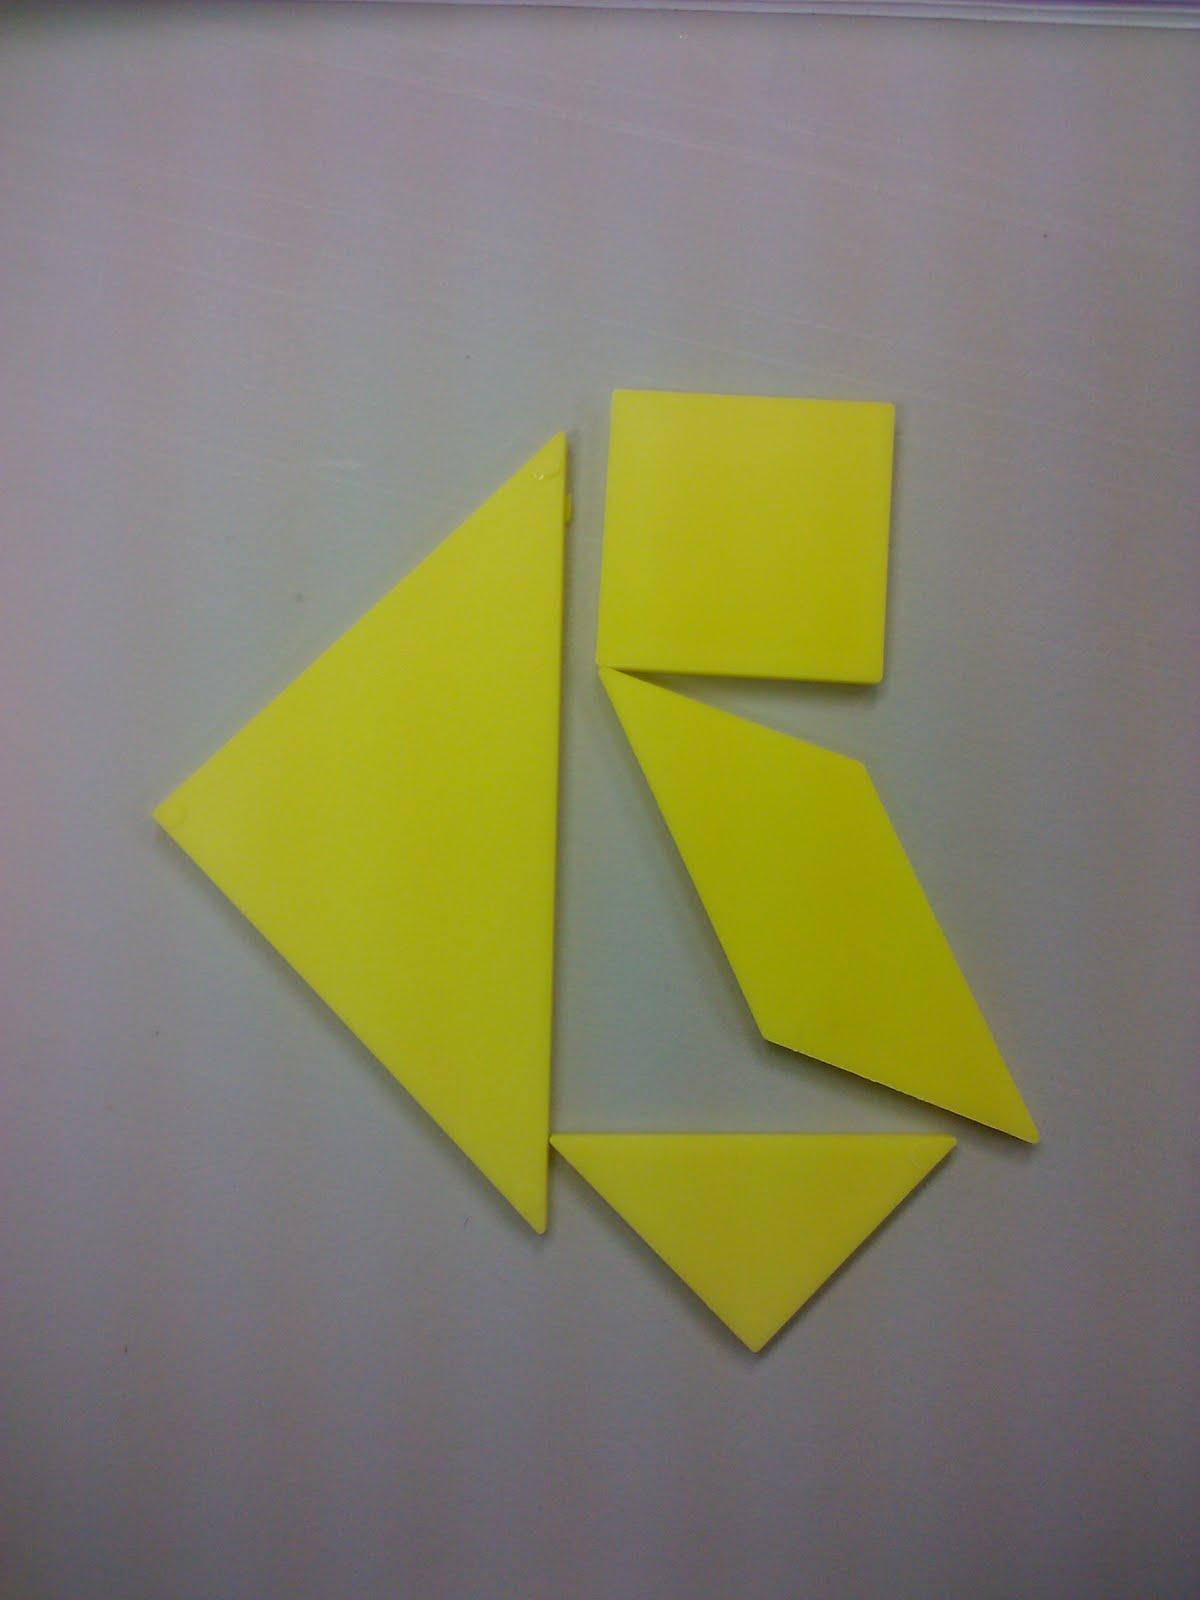 http://1.bp.blogspot.com/_g54_ssIfY_4/TGLVCIo0BJI/AAAAAAAAAN0/wHaPLkTKVKo/s1600/VP%2BPuzzle%2BPIeces.jpg